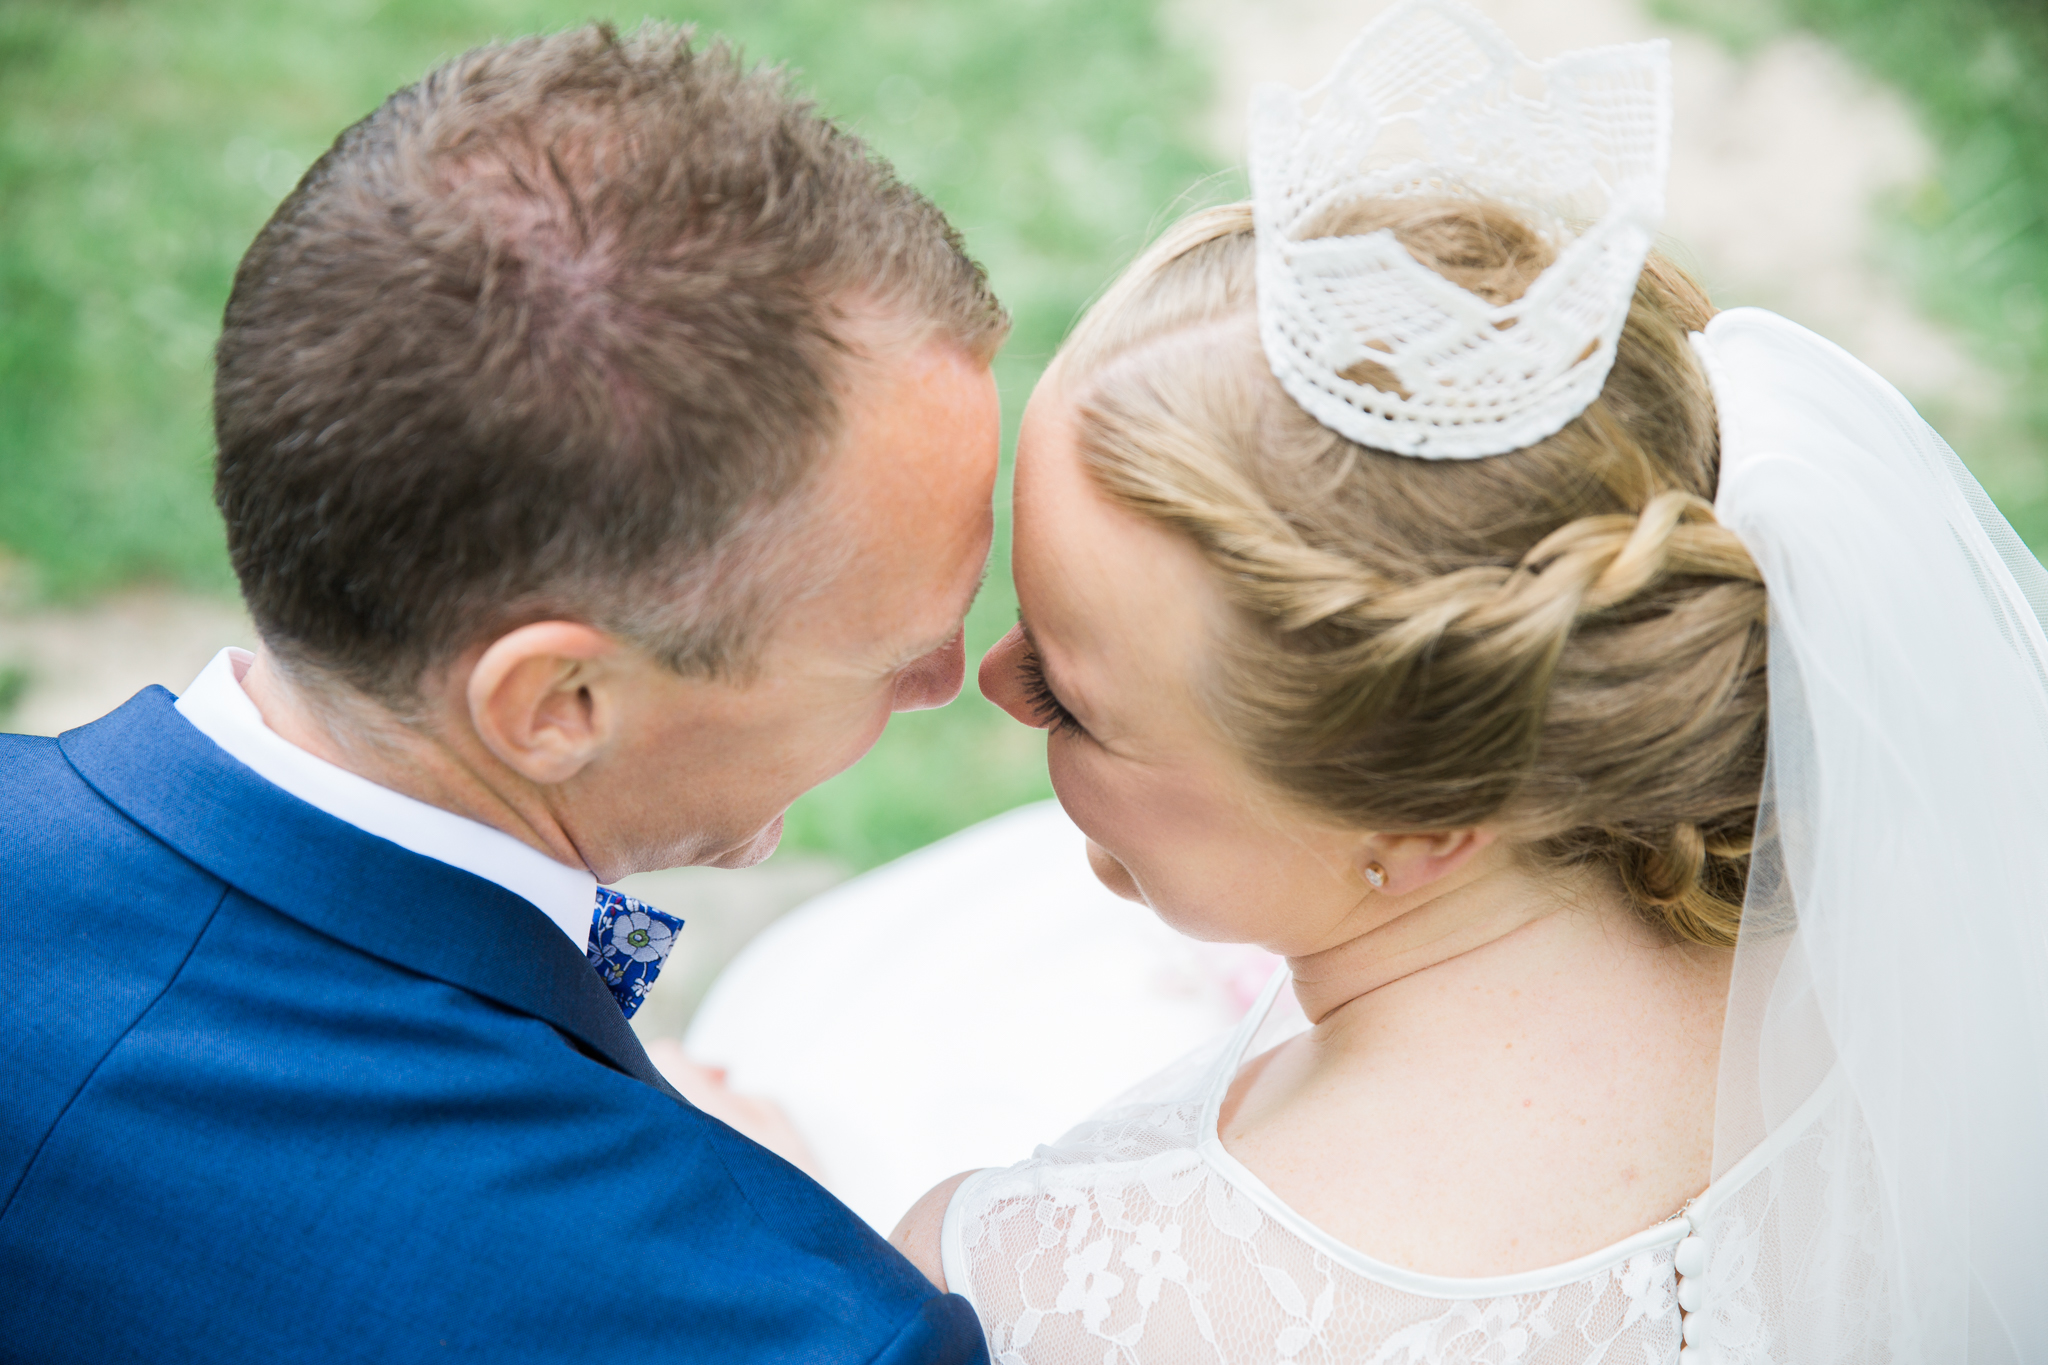 ViOli Photography bröllopsfotograf-Karlshamn-Blekinge-Ronneby-Karlskrona-Sölvesborg-Bromölla-Kristianstad (13 av 35)